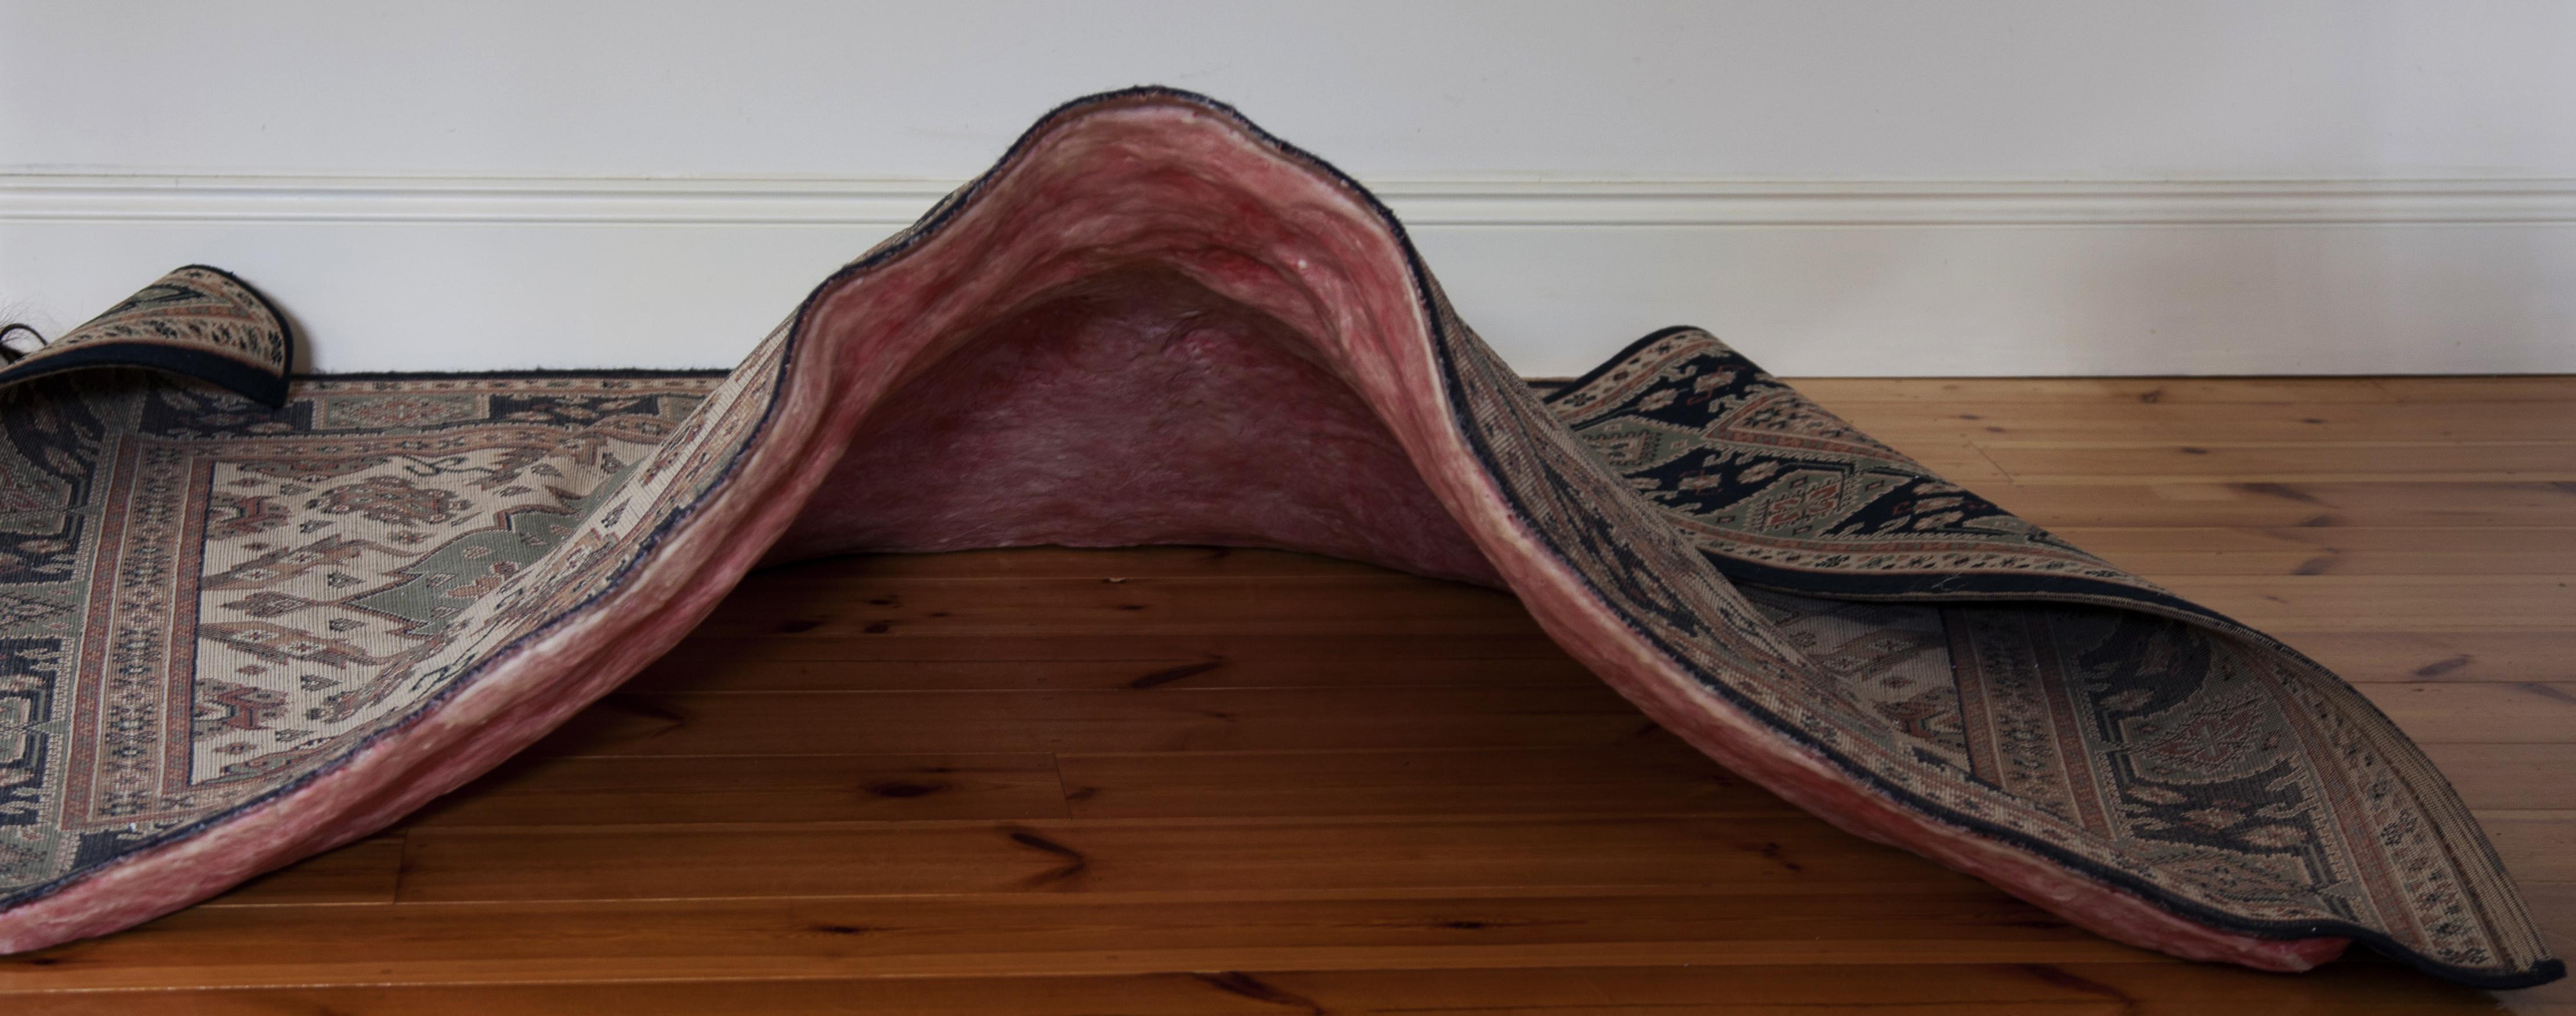 Sculpture Claire Marsh Artist